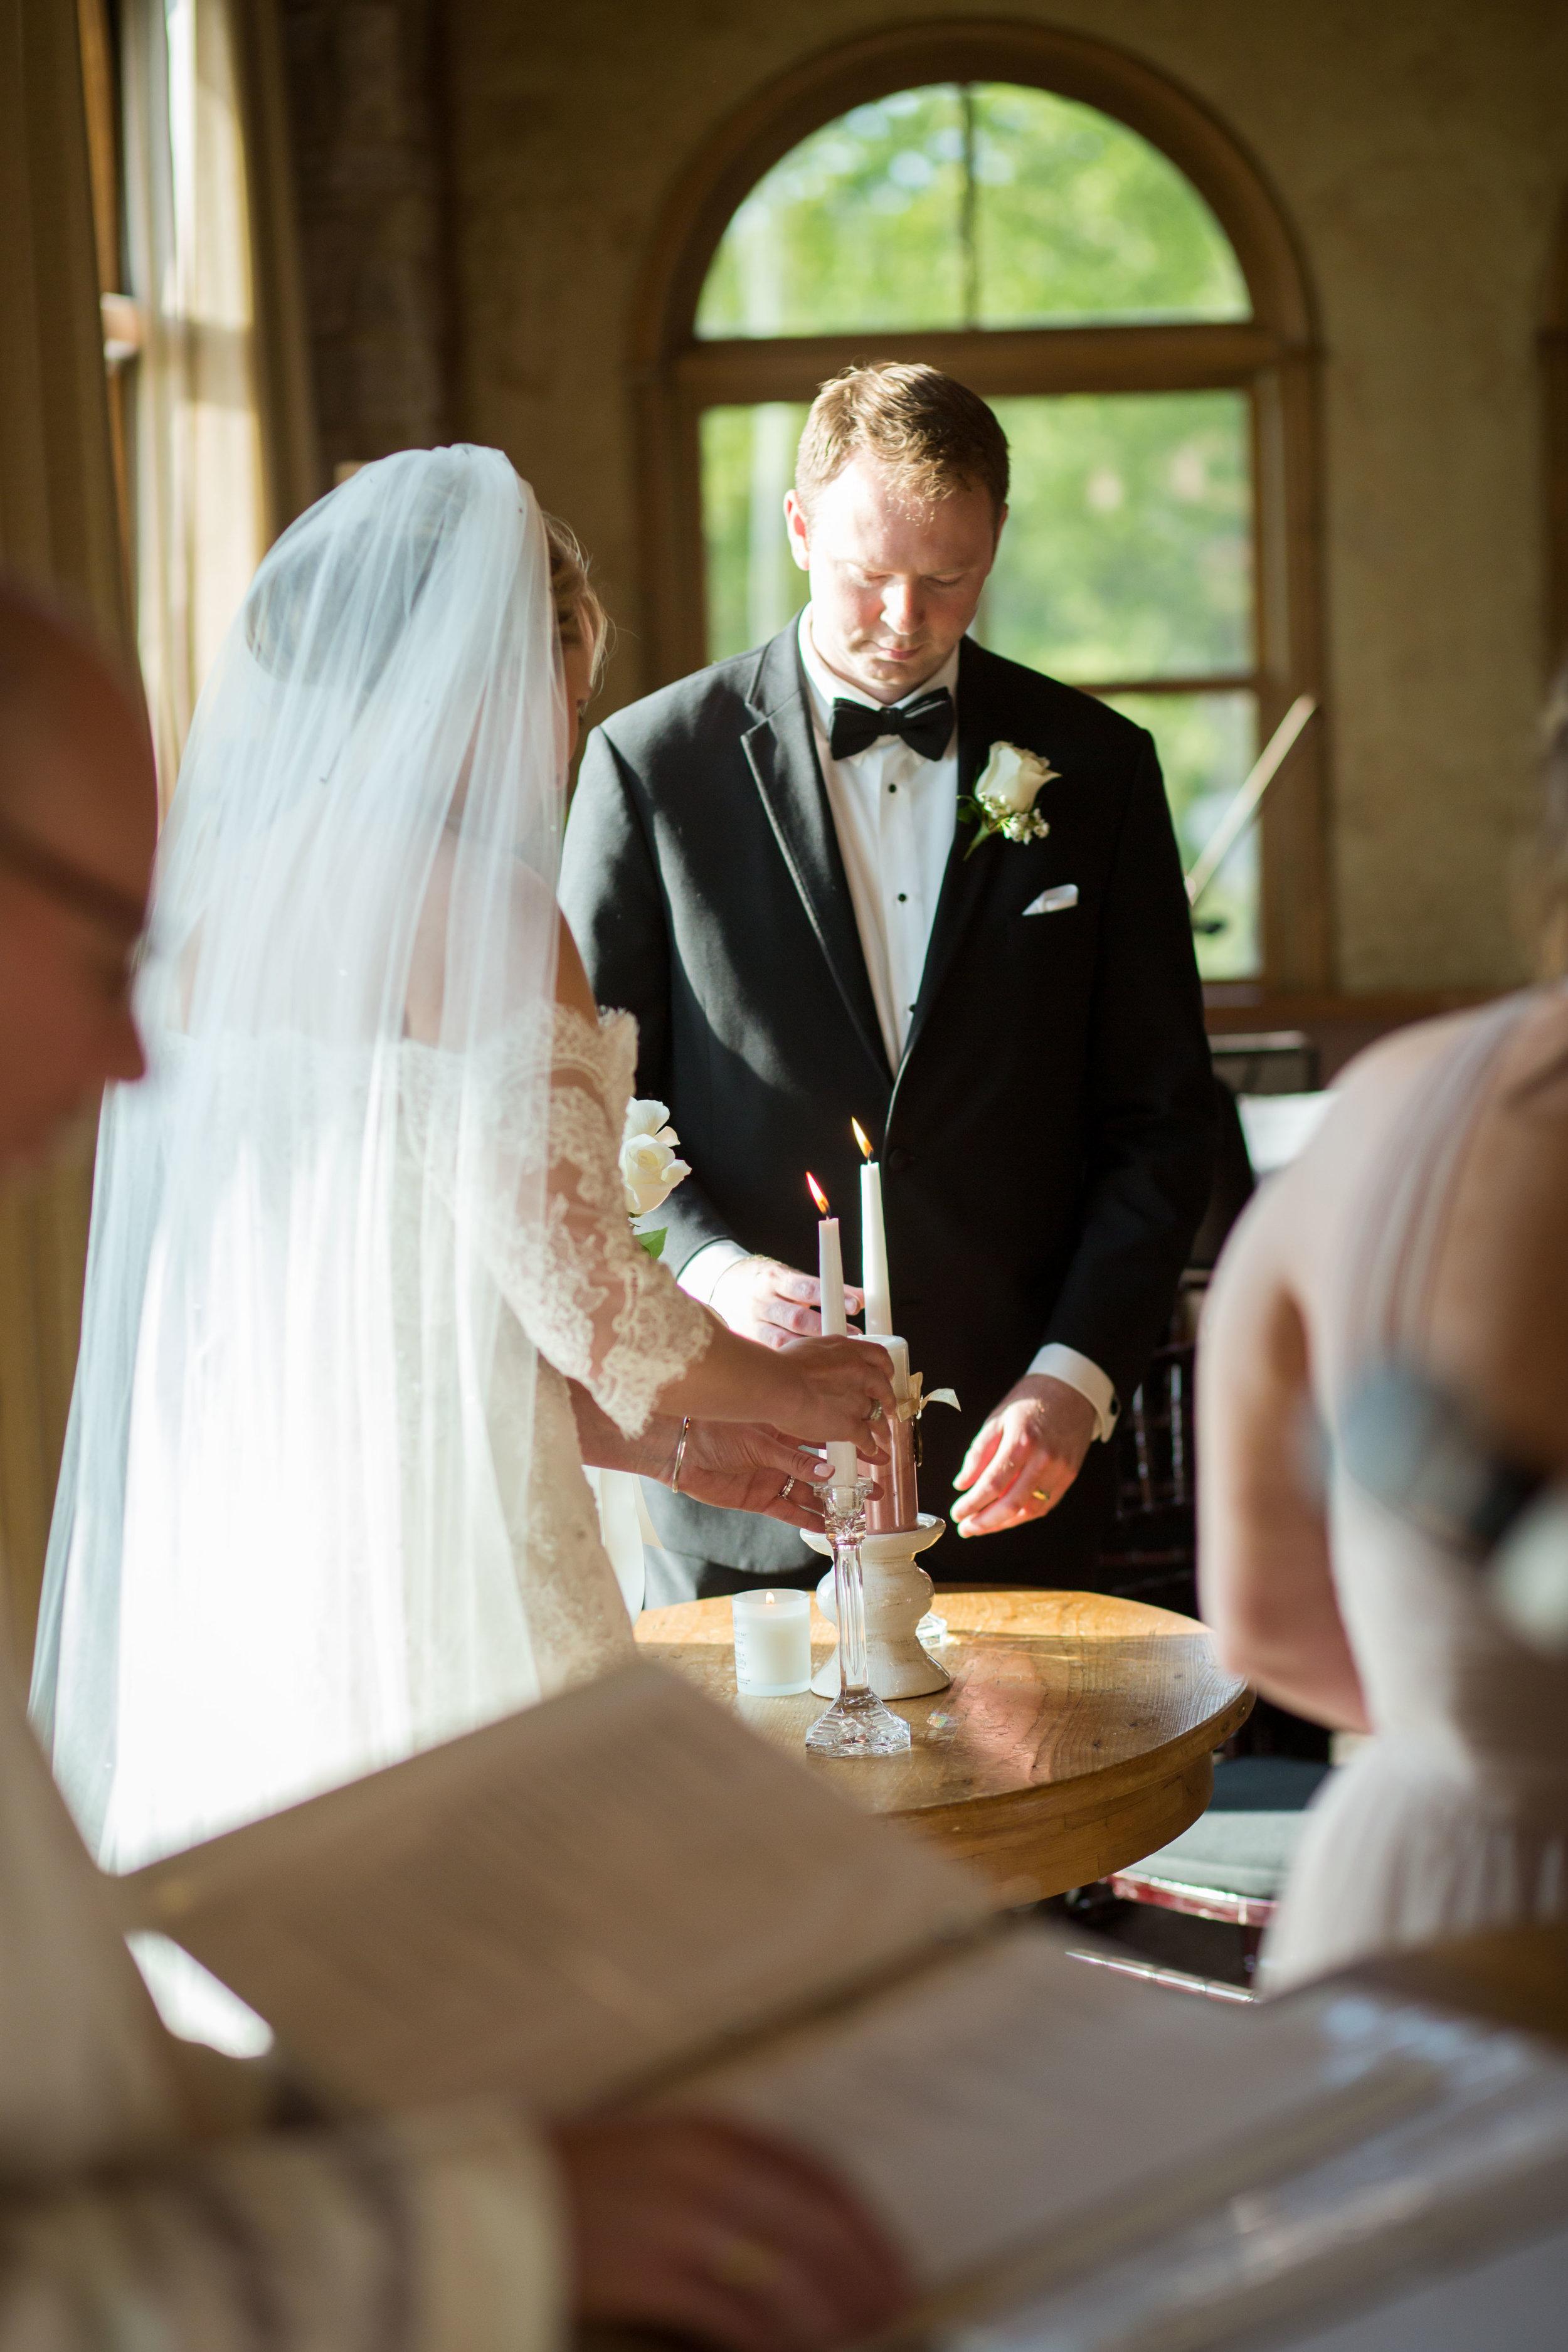 Wedding Photo at Integrity Hills Chapel